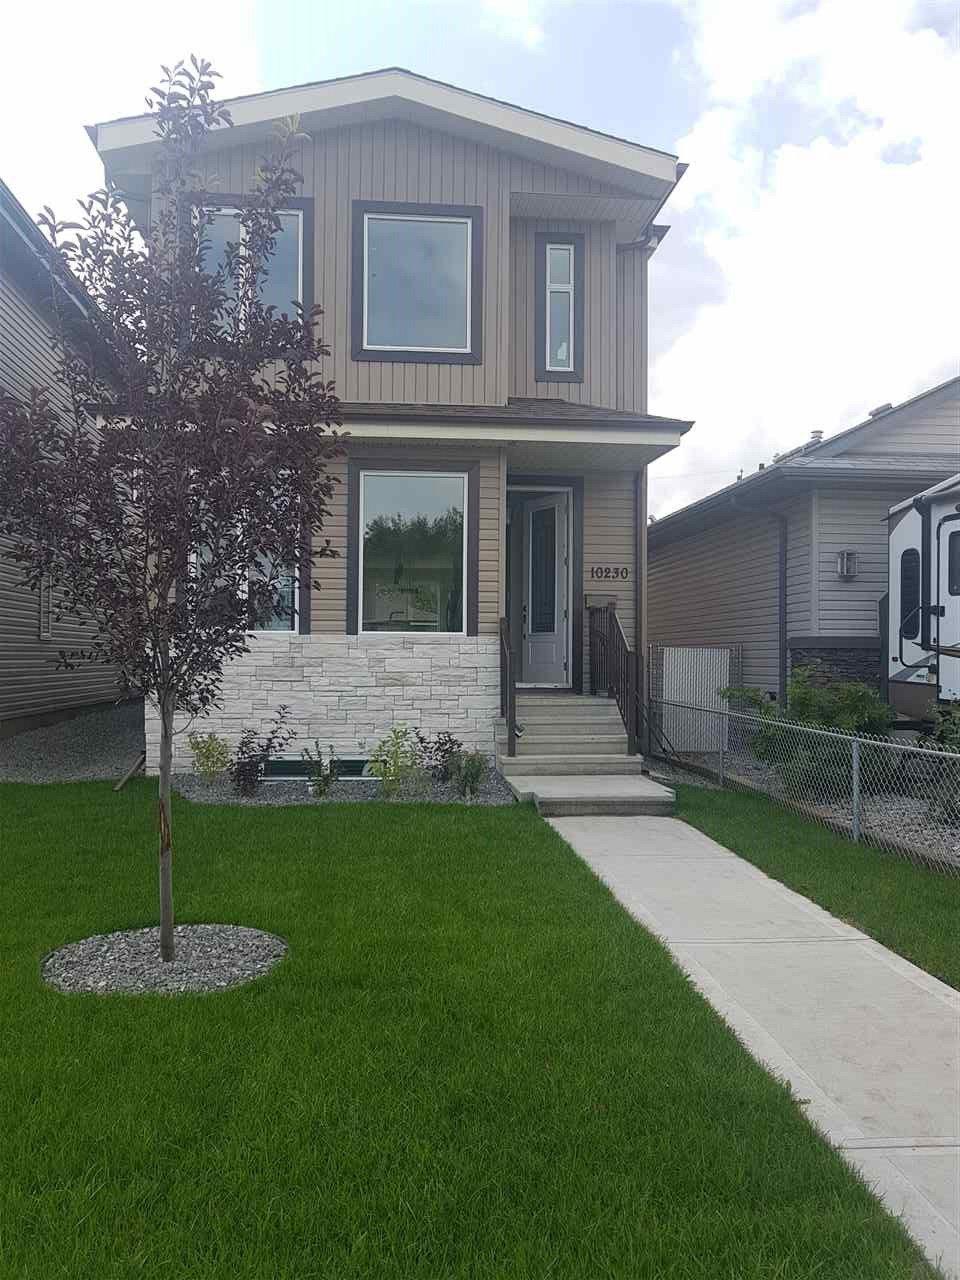 Main Photo: 10230 161 Street in Edmonton: Zone 21 House for sale : MLS®# E4170442